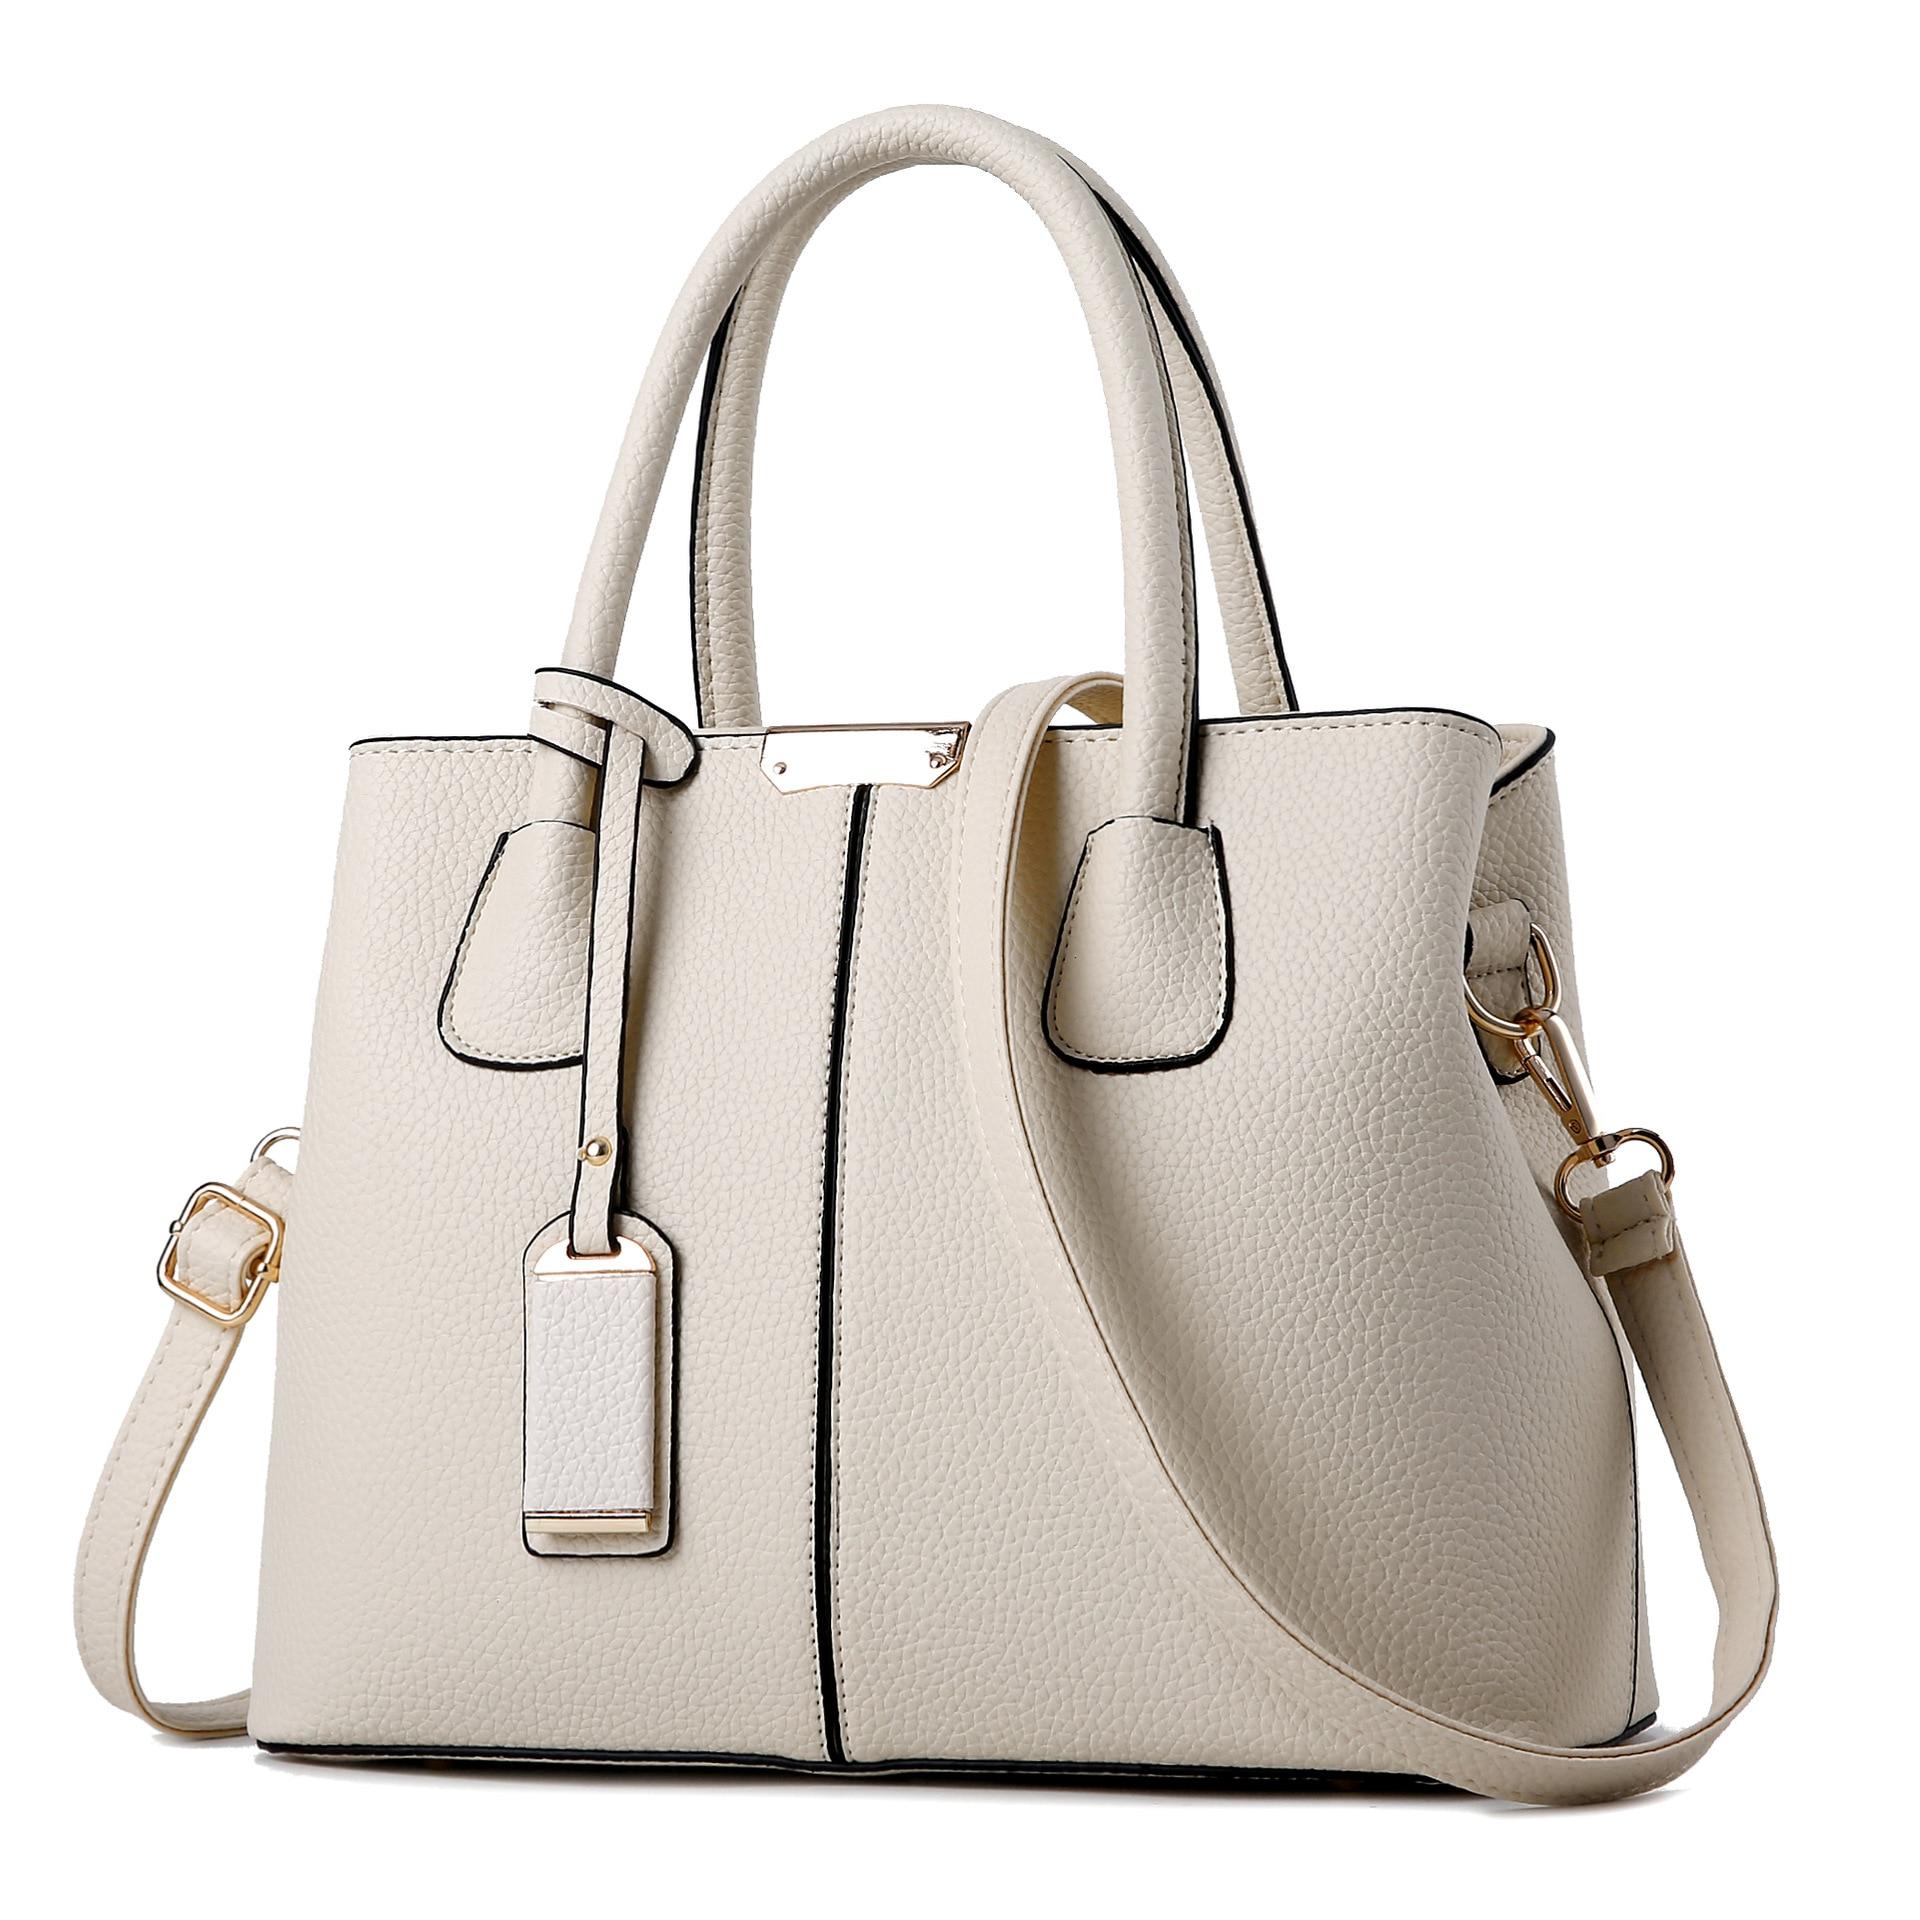 women bag Fashion Casual women's leather handbags Luxury Designer Shoulder bags new bags for women 2019